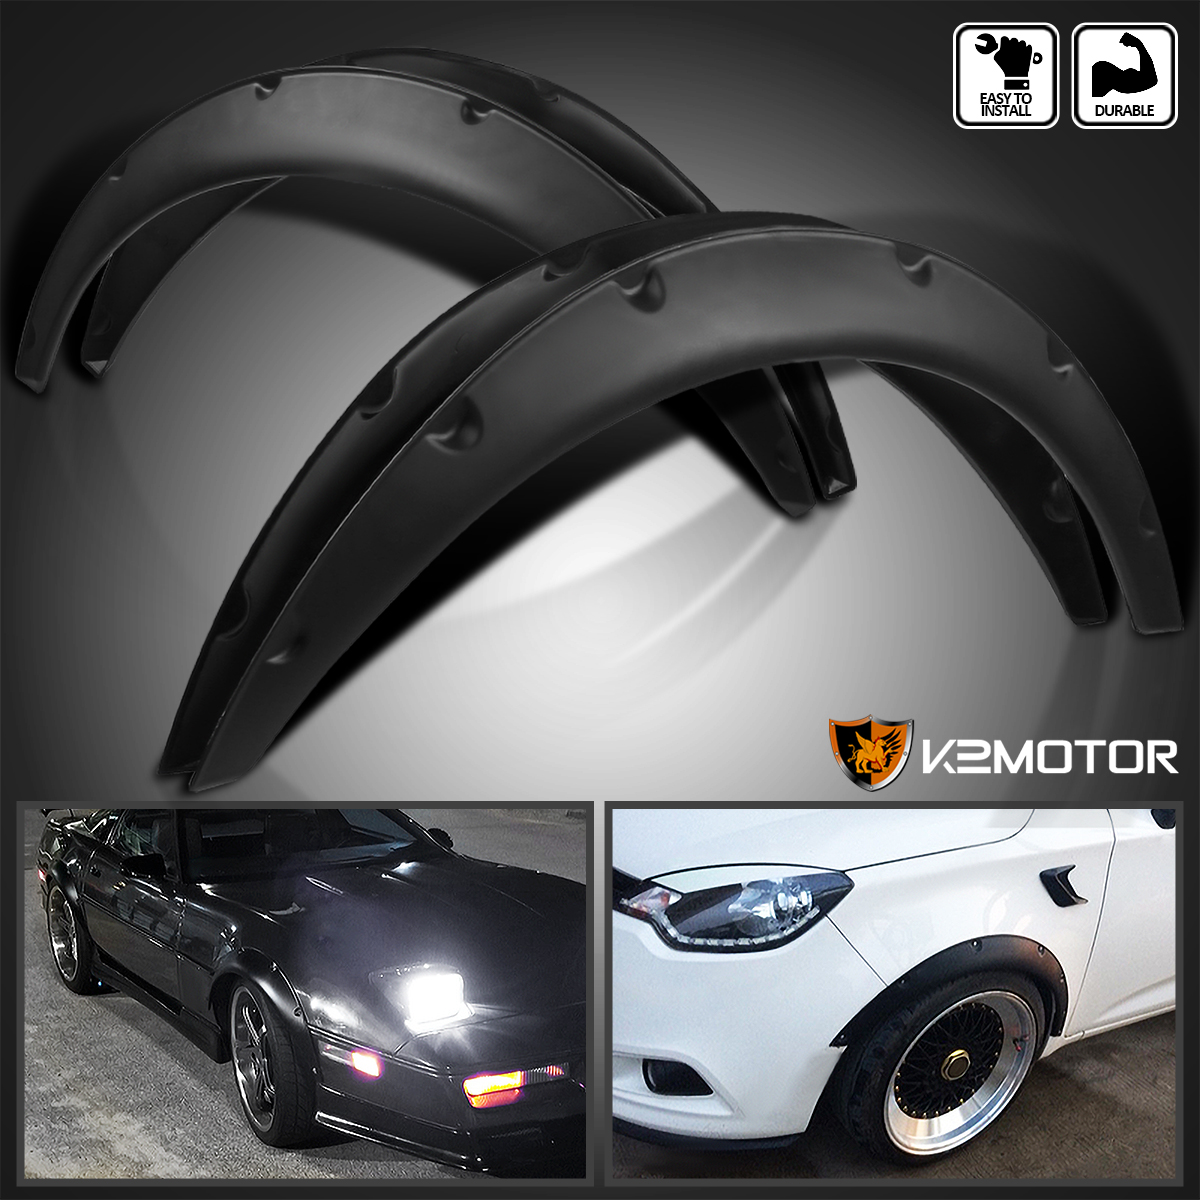 Yosoo 4Pcs 4.3//110mm Universal Flexible Car Front /& Rear Fender Flares Extra Wide Body Wheel Arches